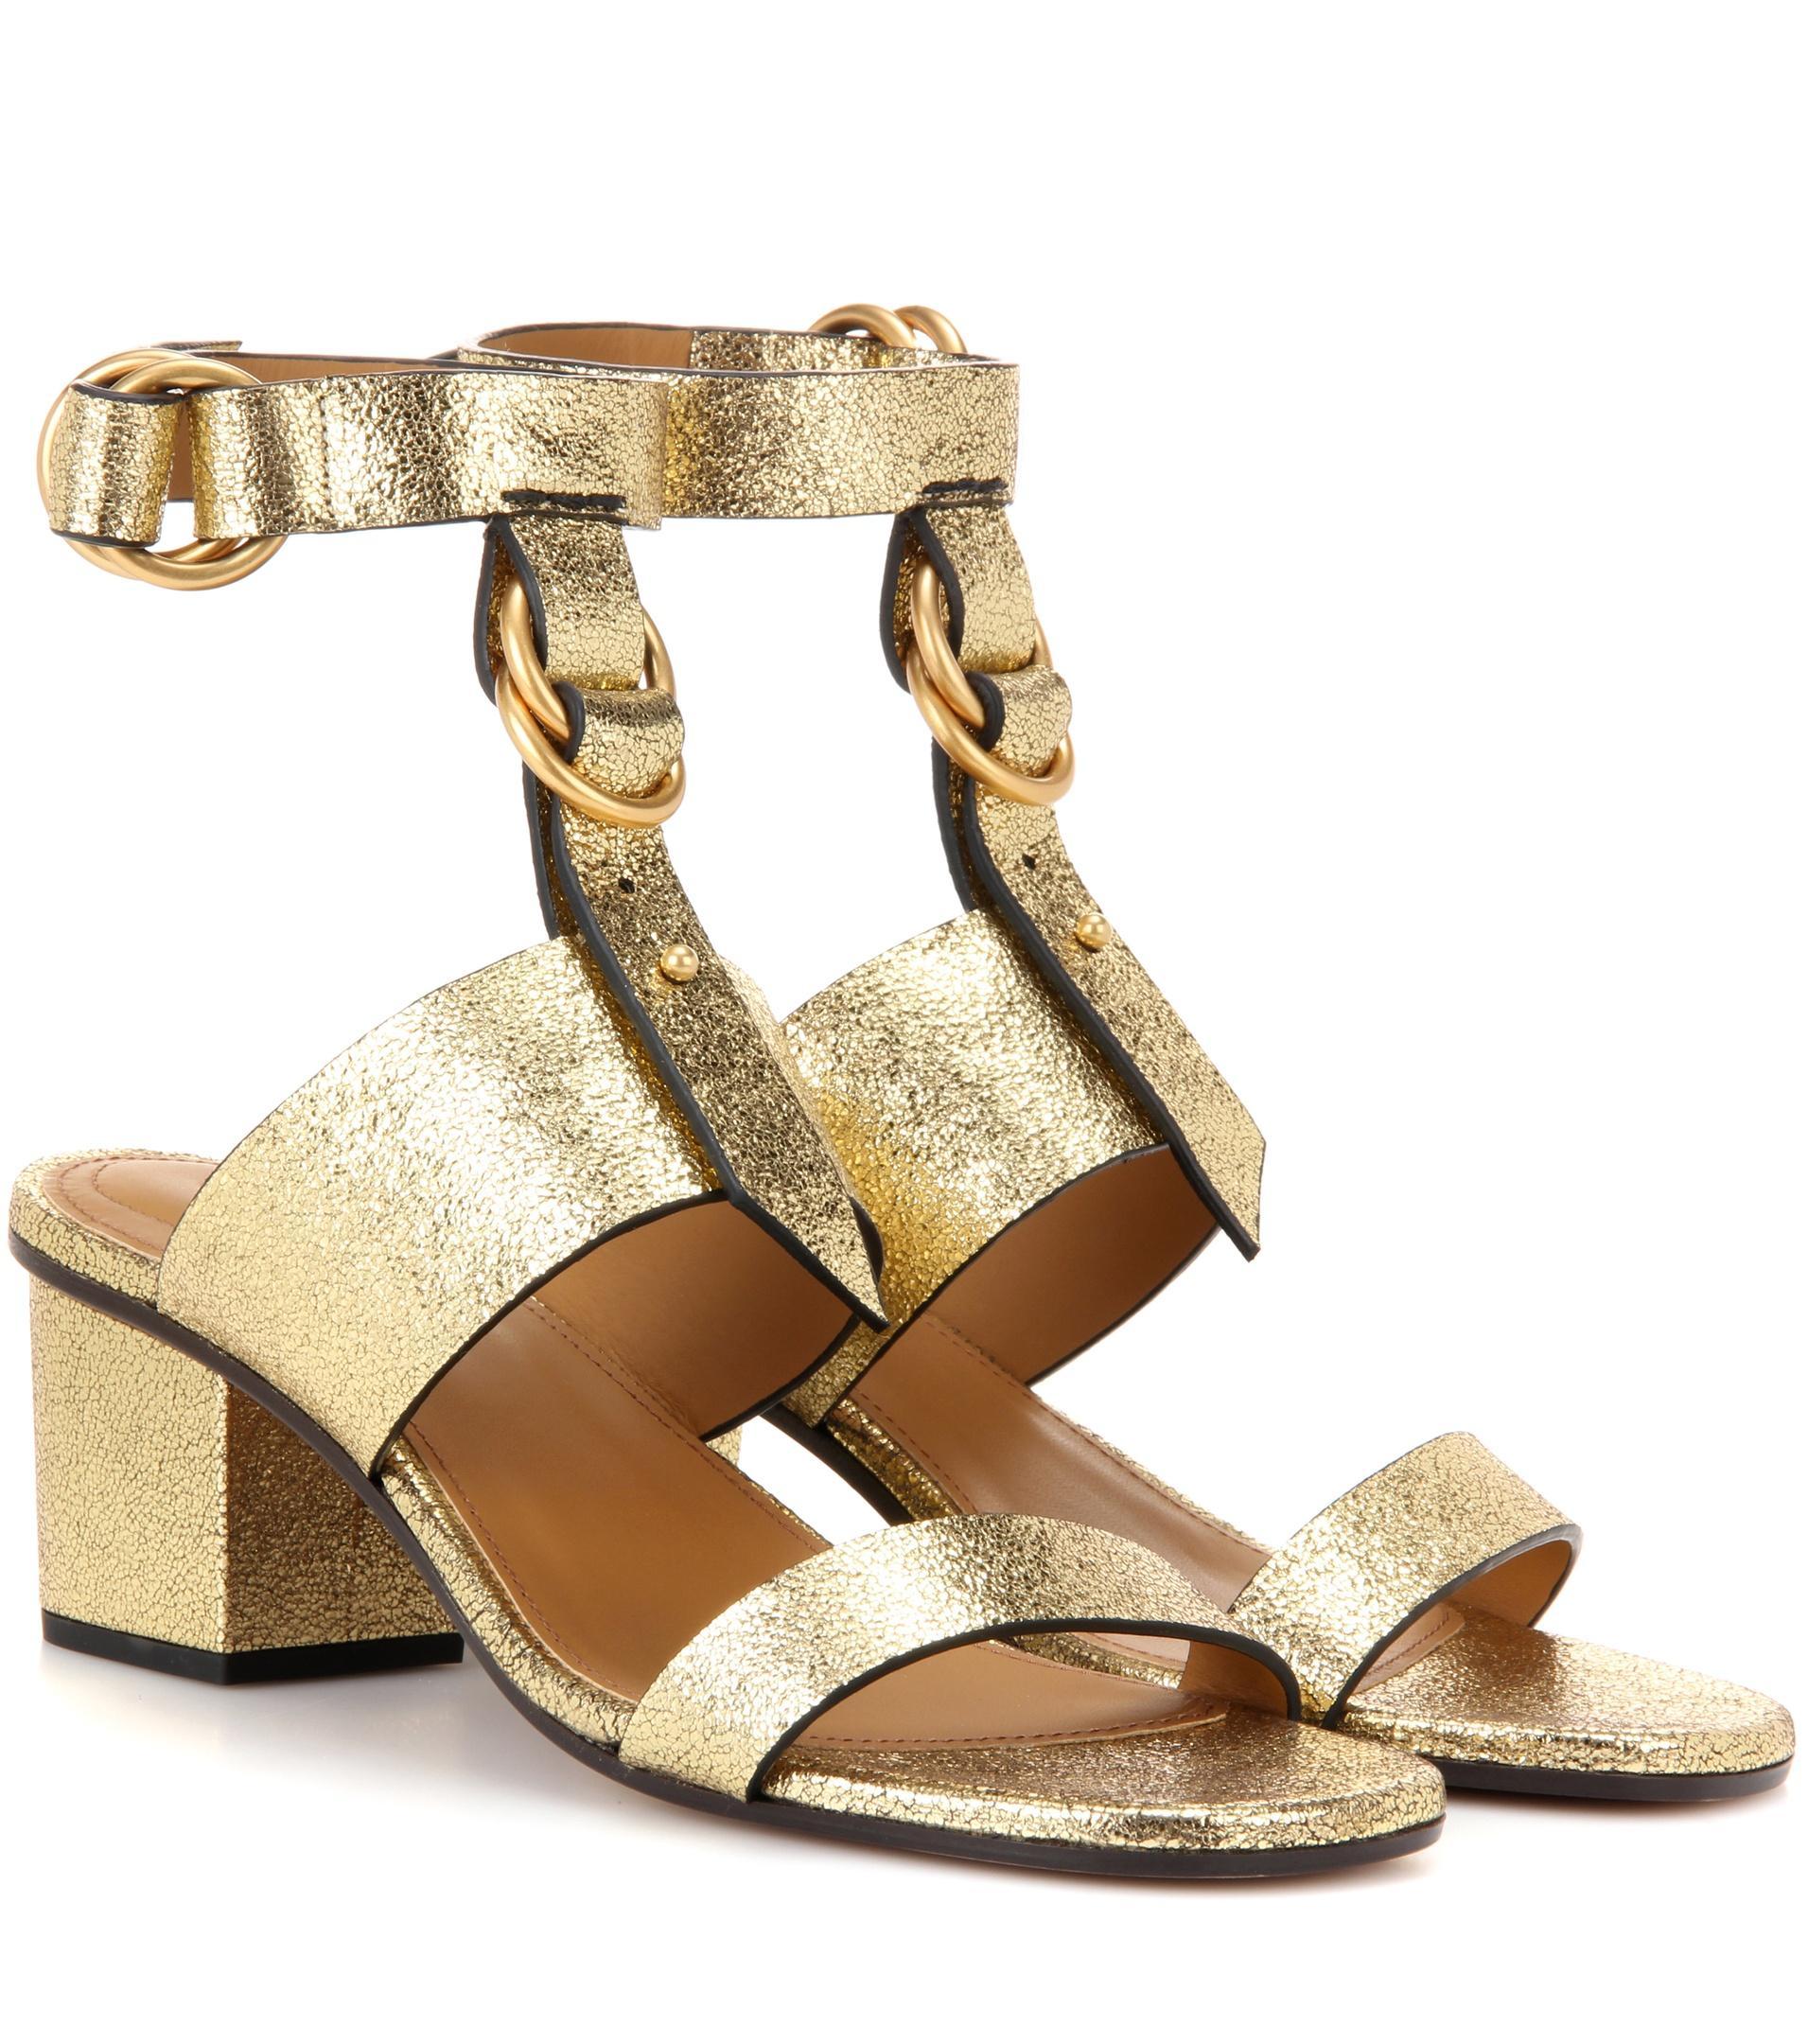 59b9bf35390 Lyst - Chloé Kingsley High Sandals in Metallic